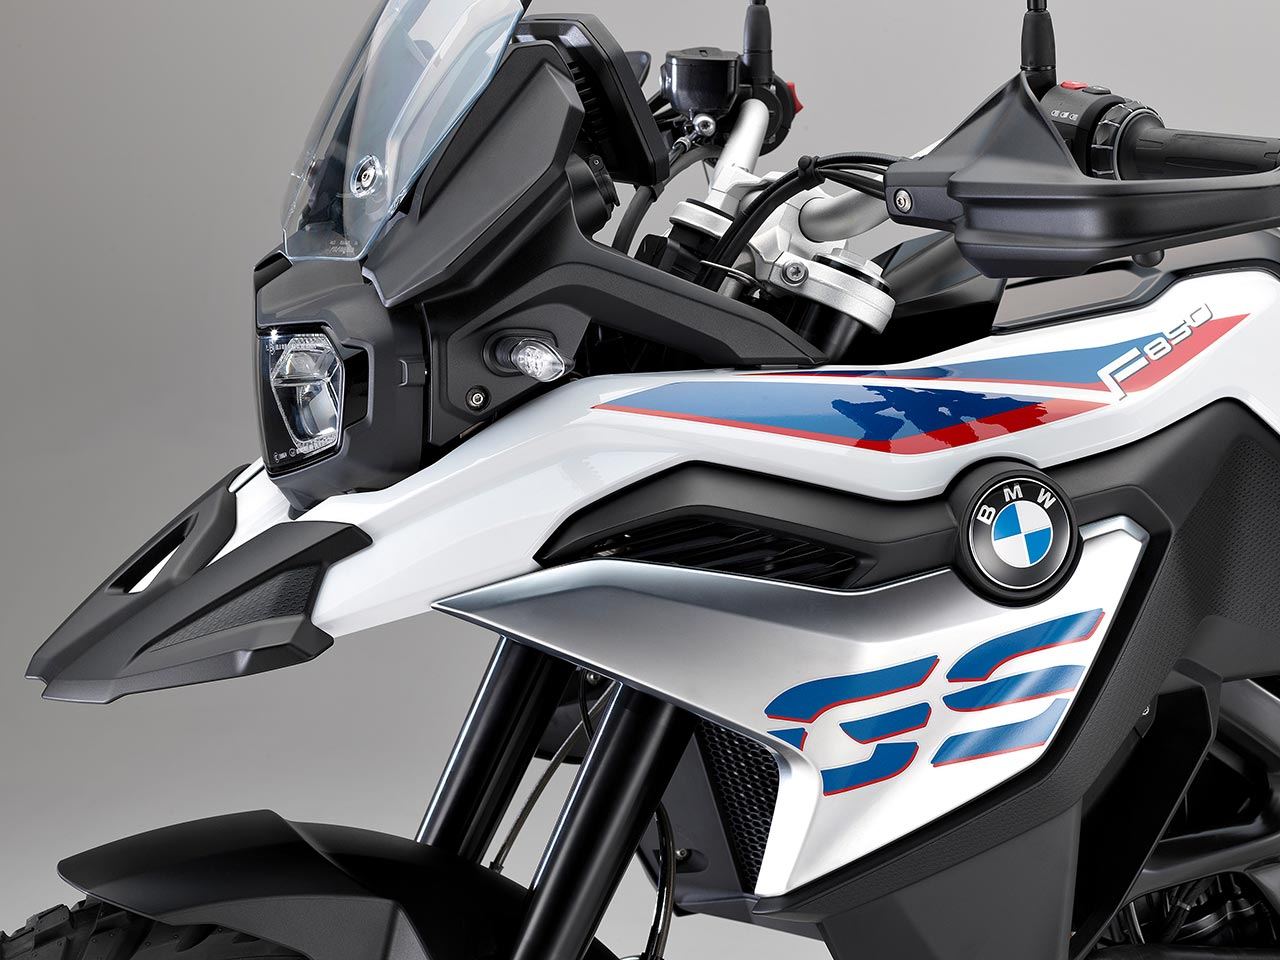 BMW F850GS styling